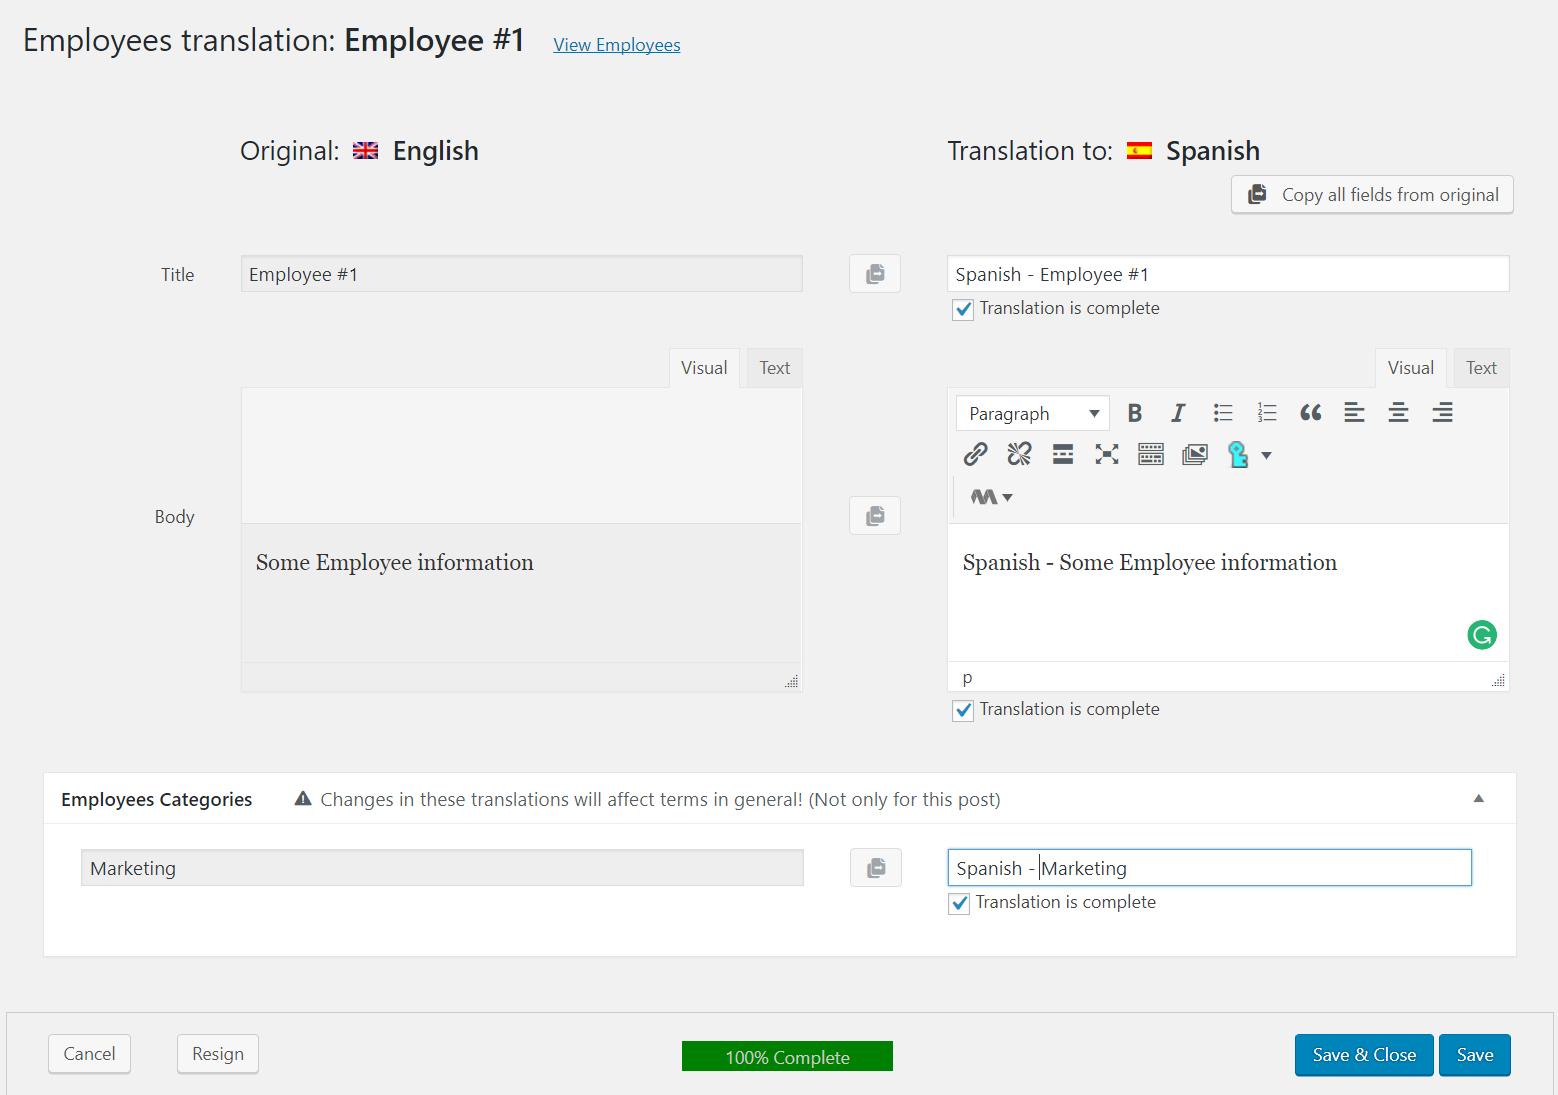 Translate the Employee item